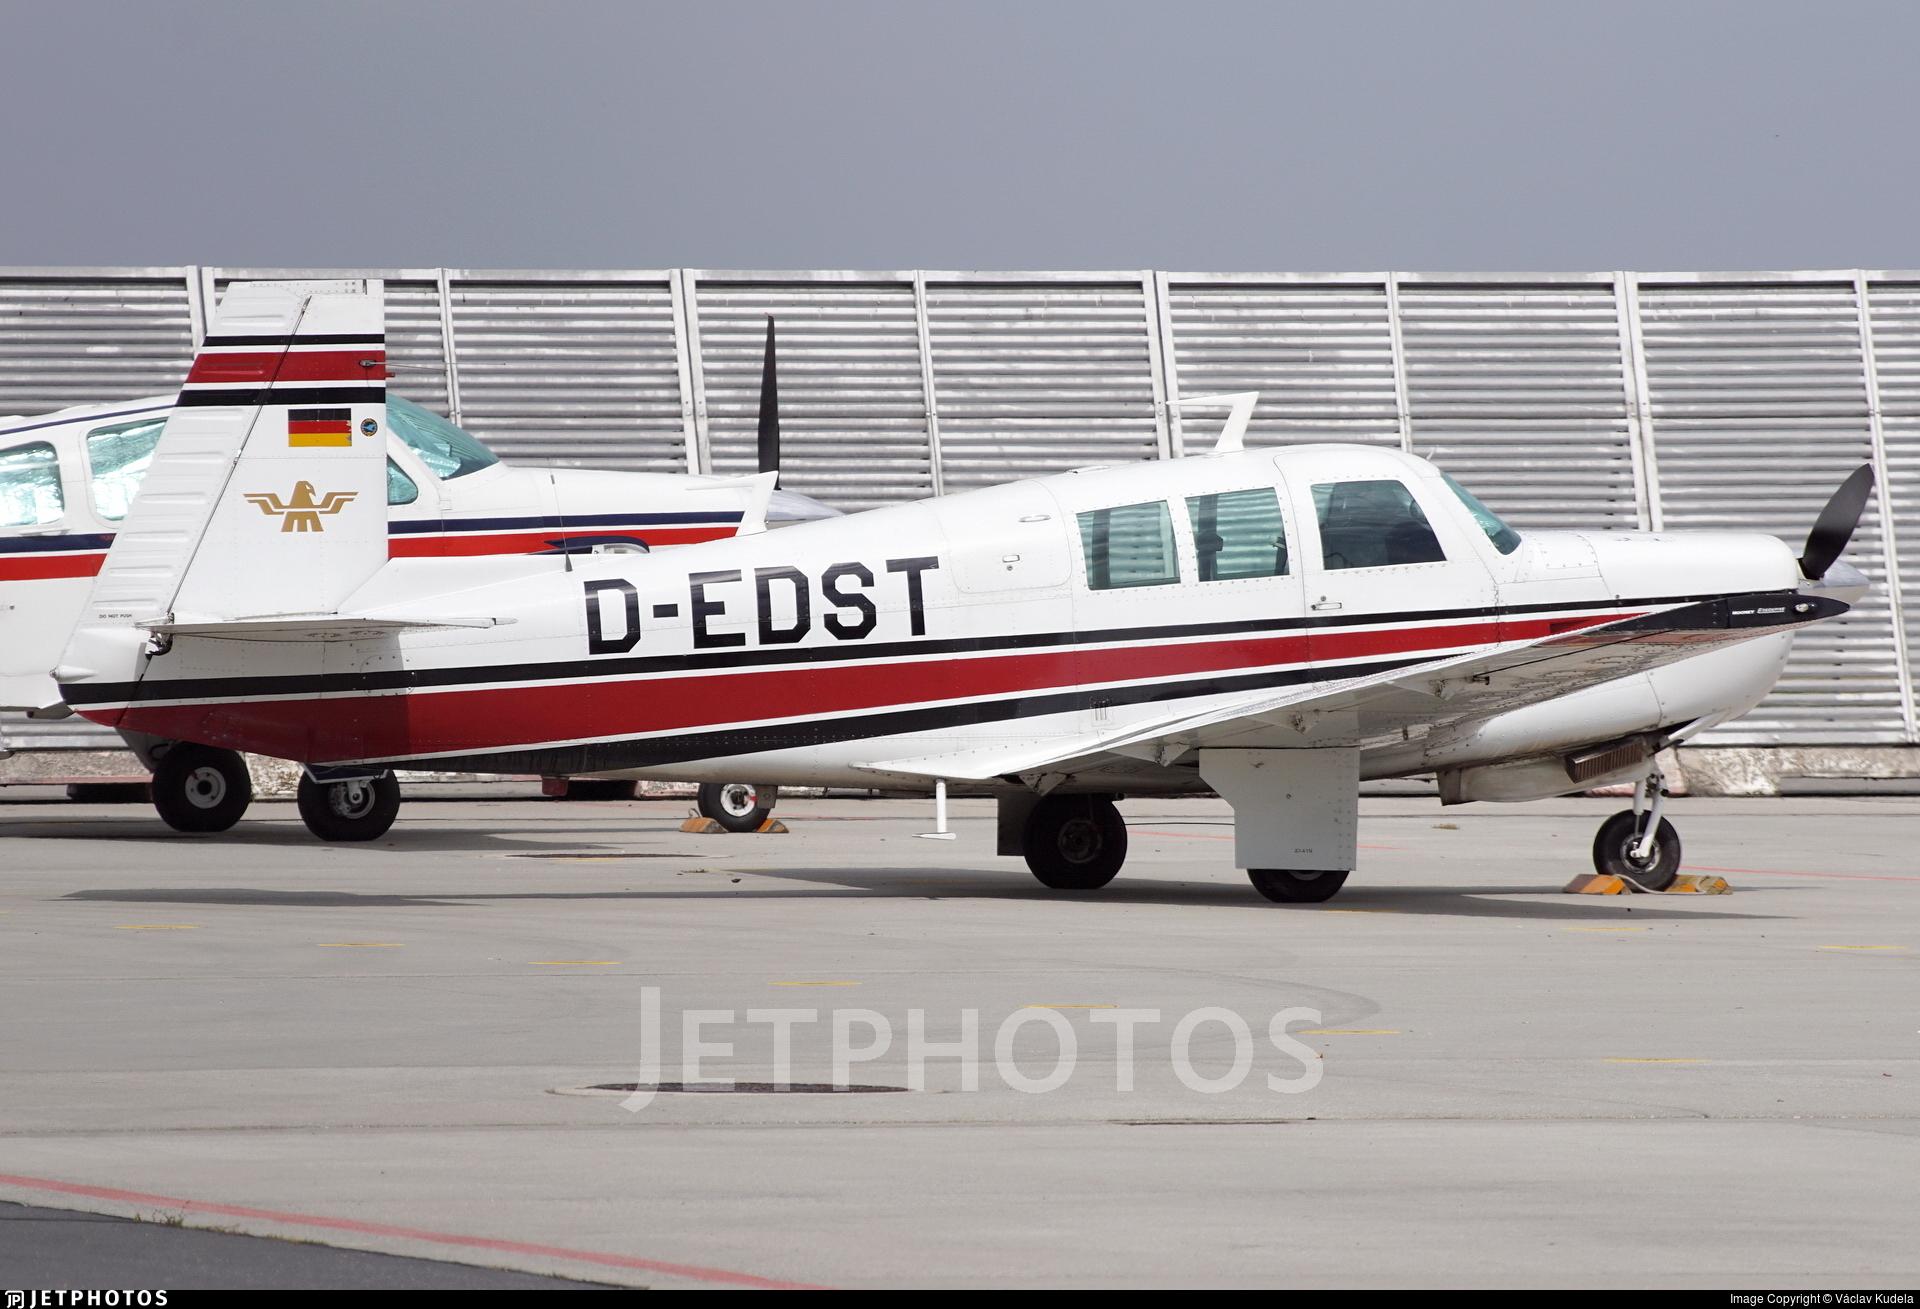 D-EDST - Mooney M20F Executive 21 - Private